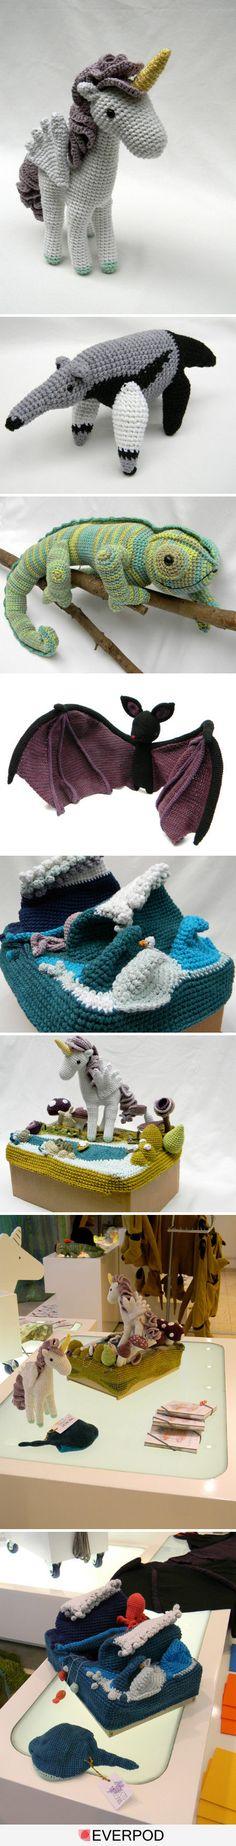 Awesome amigurumi with scenery! Gato Crochet, Crochet Amigurumi, Amigurumi Patterns, Amigurumi Doll, Crochet Dolls, Crochet Patterns, Crochet Unicorn, Crochet Ideas, Crochet For Kids